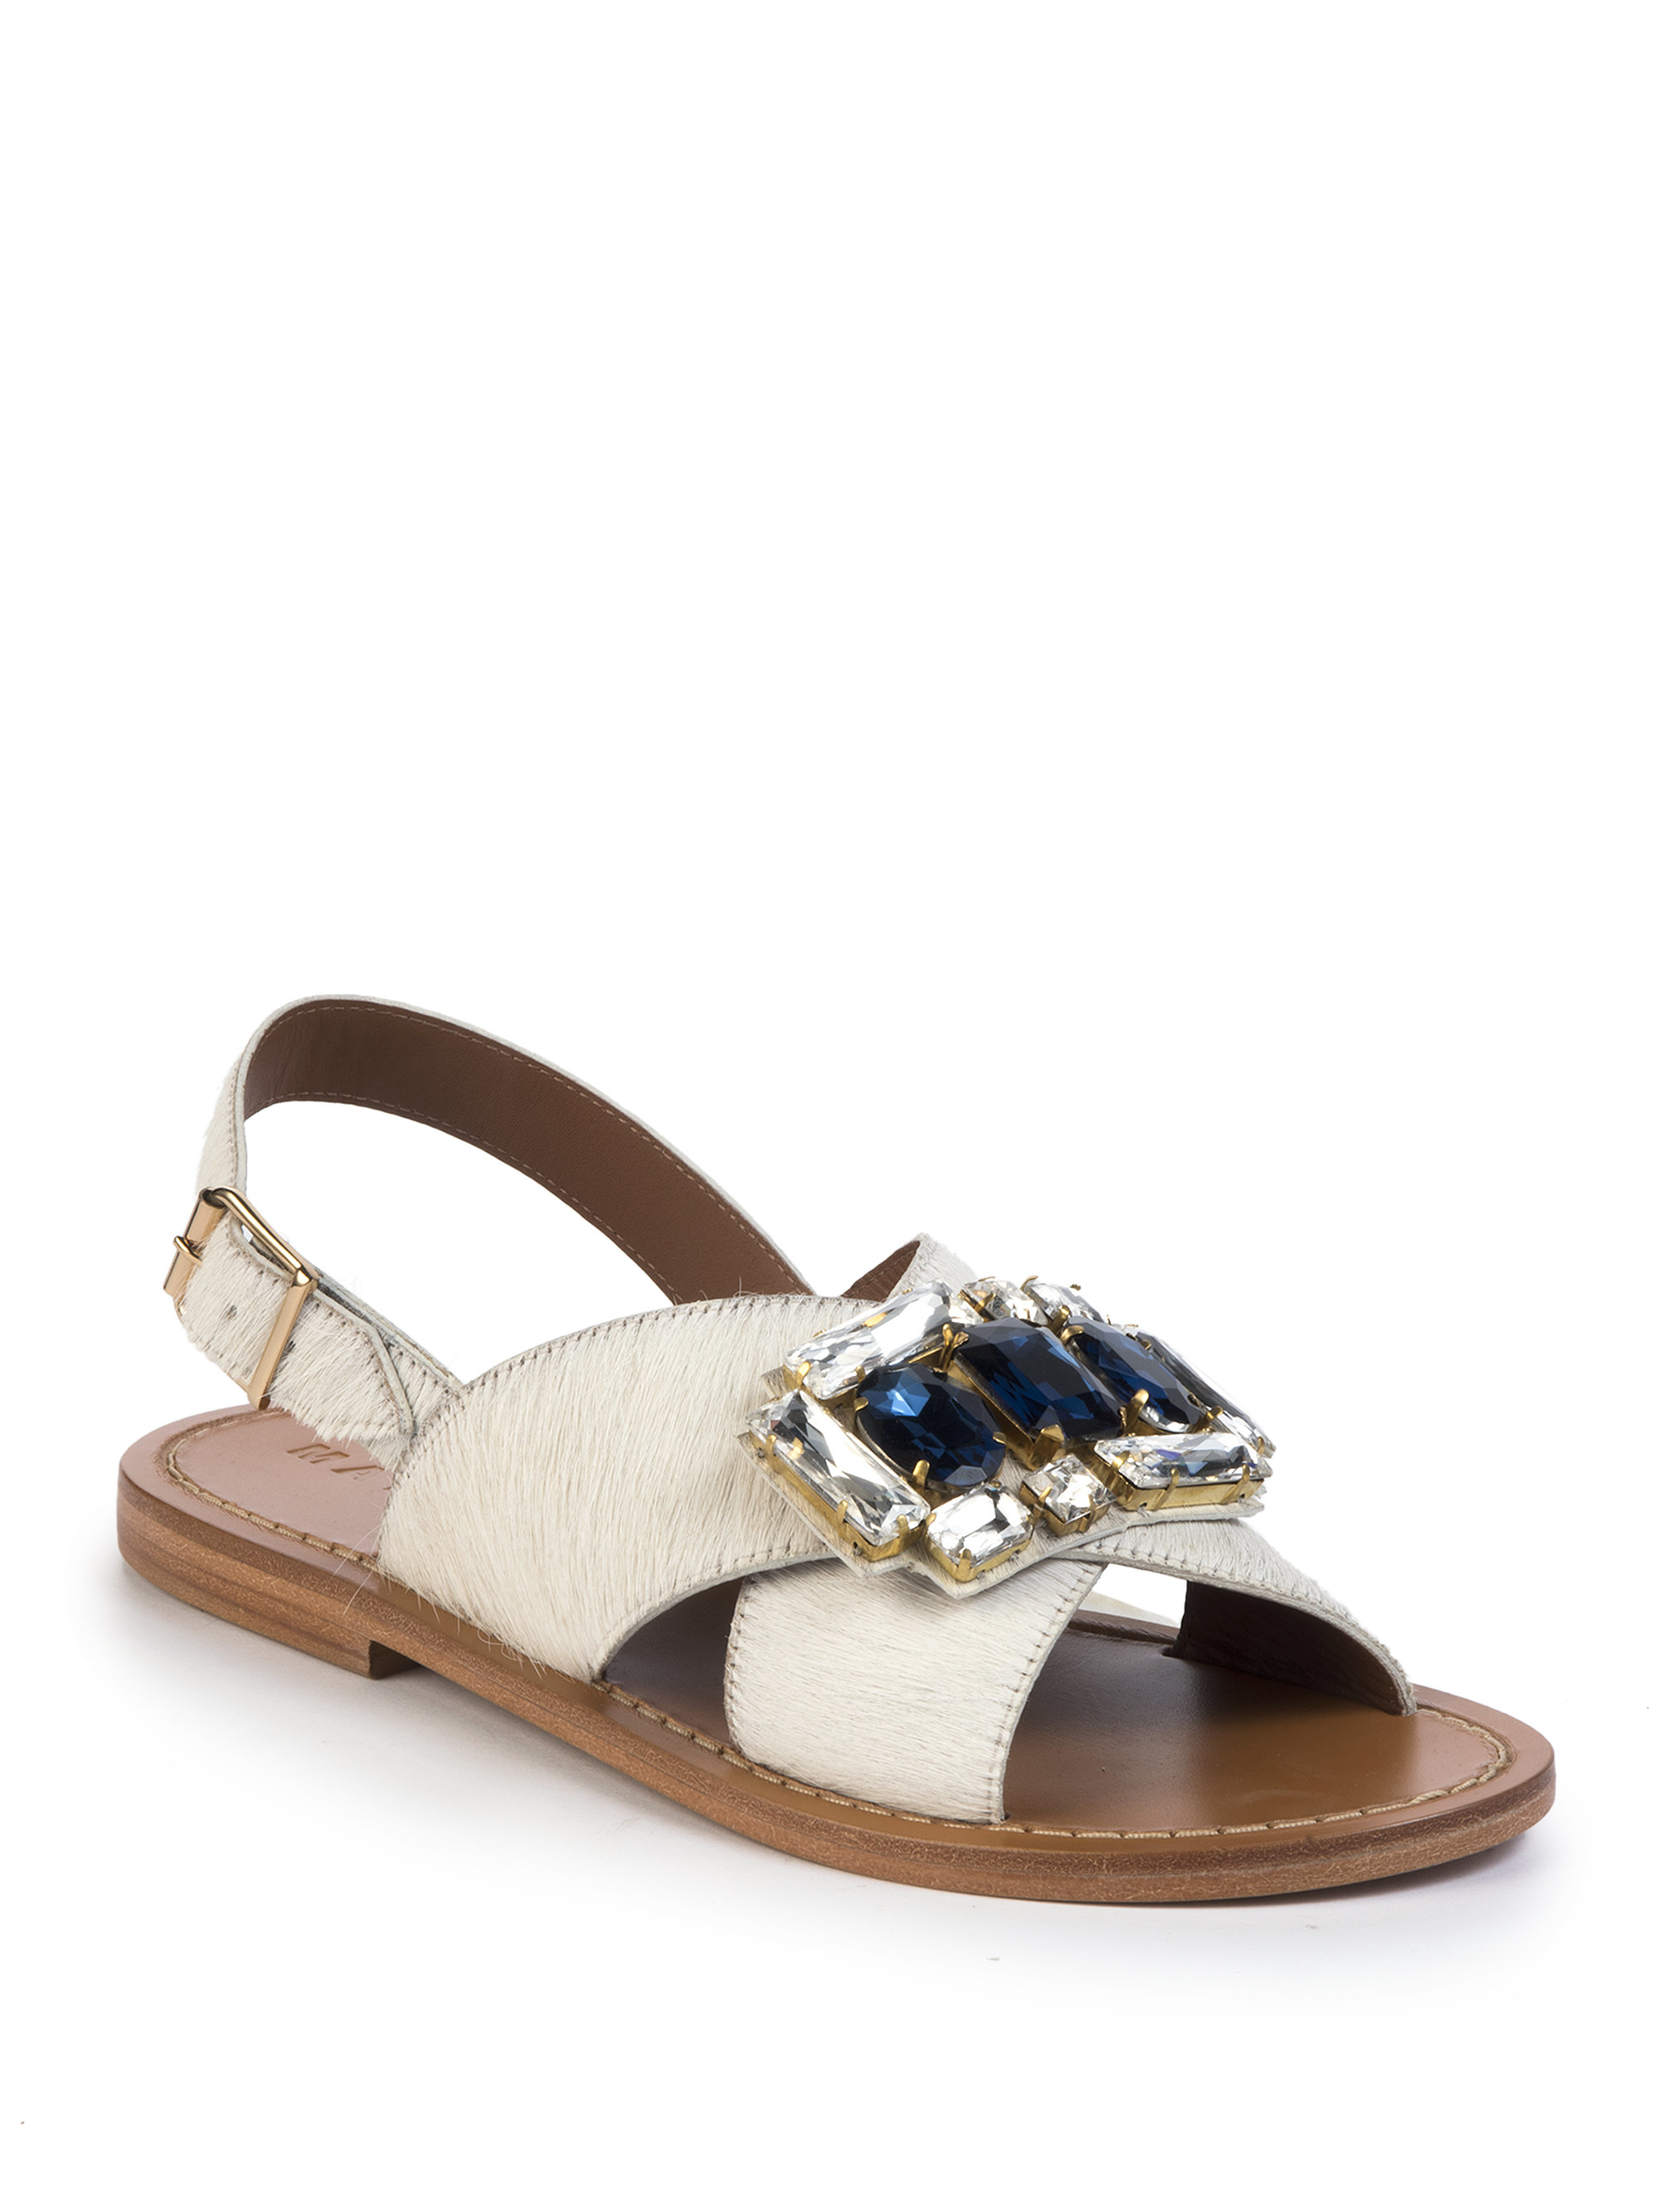 Marni Jeweled Calf Hair Crisscross Flat Sandals In White | Lyst